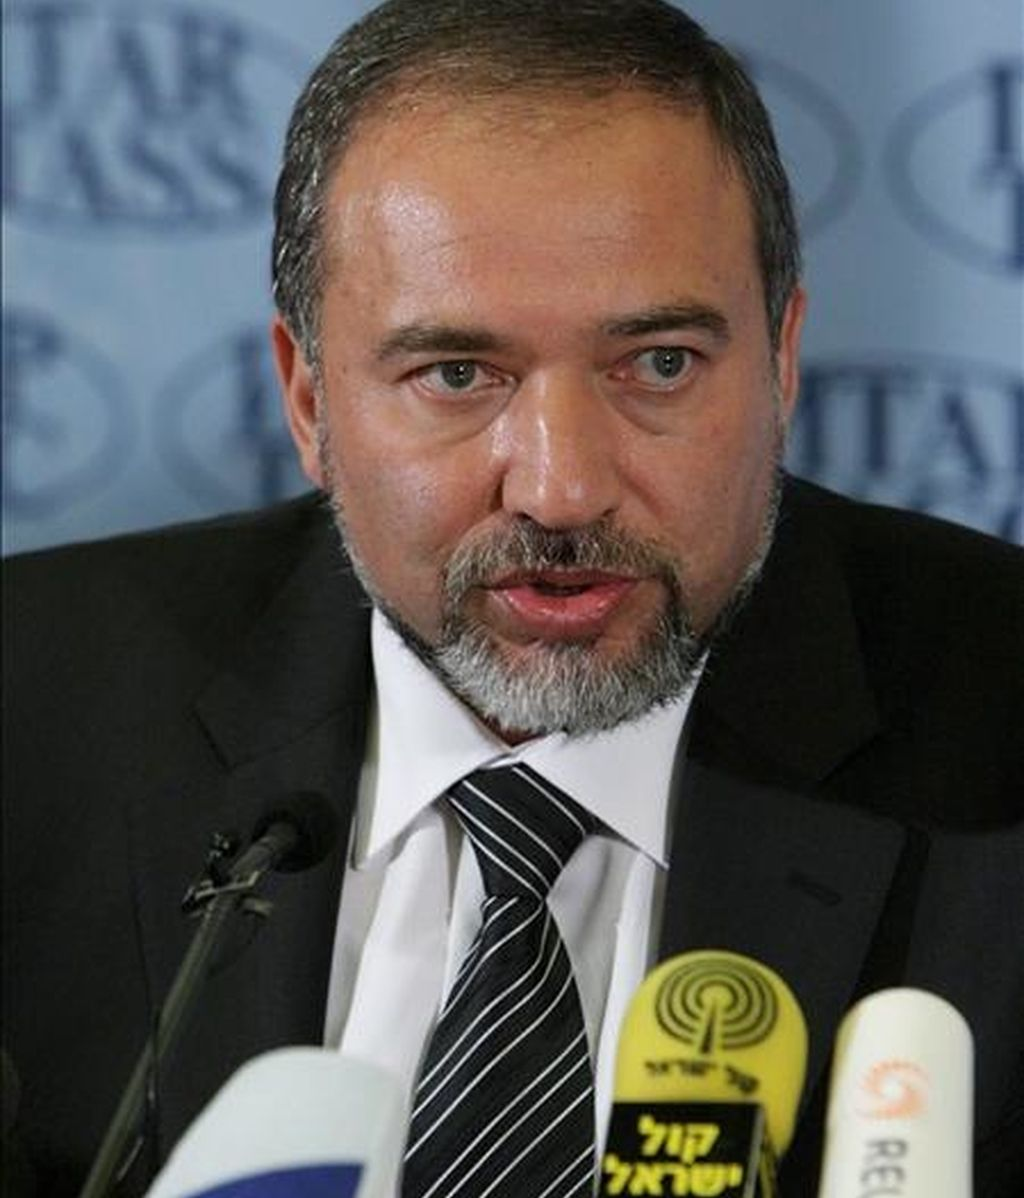 El ministro de Exteriores israelí, Avigdor Liebermann, hoy en Moscú. EFE